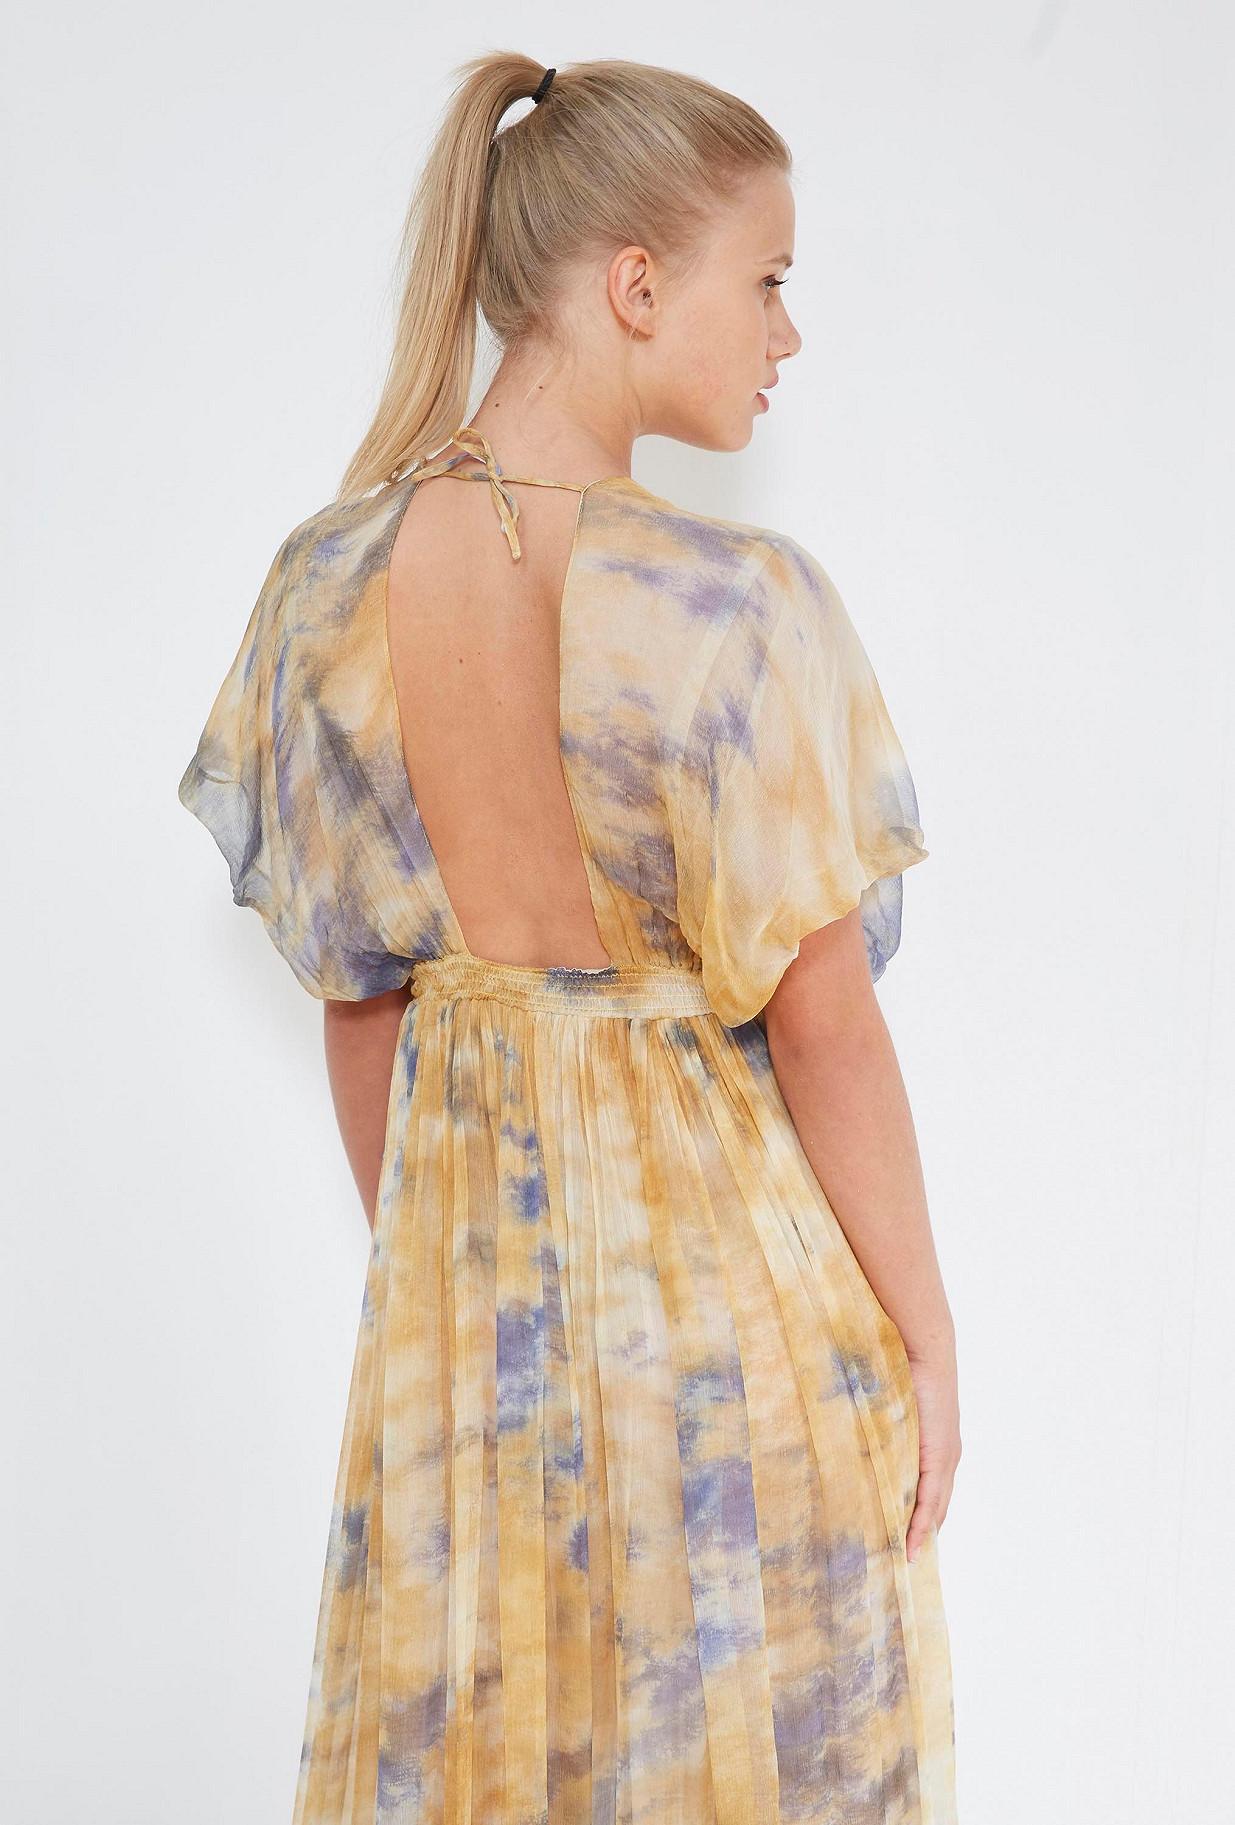 clothes store DRESS  Arizona french designer fashion Paris